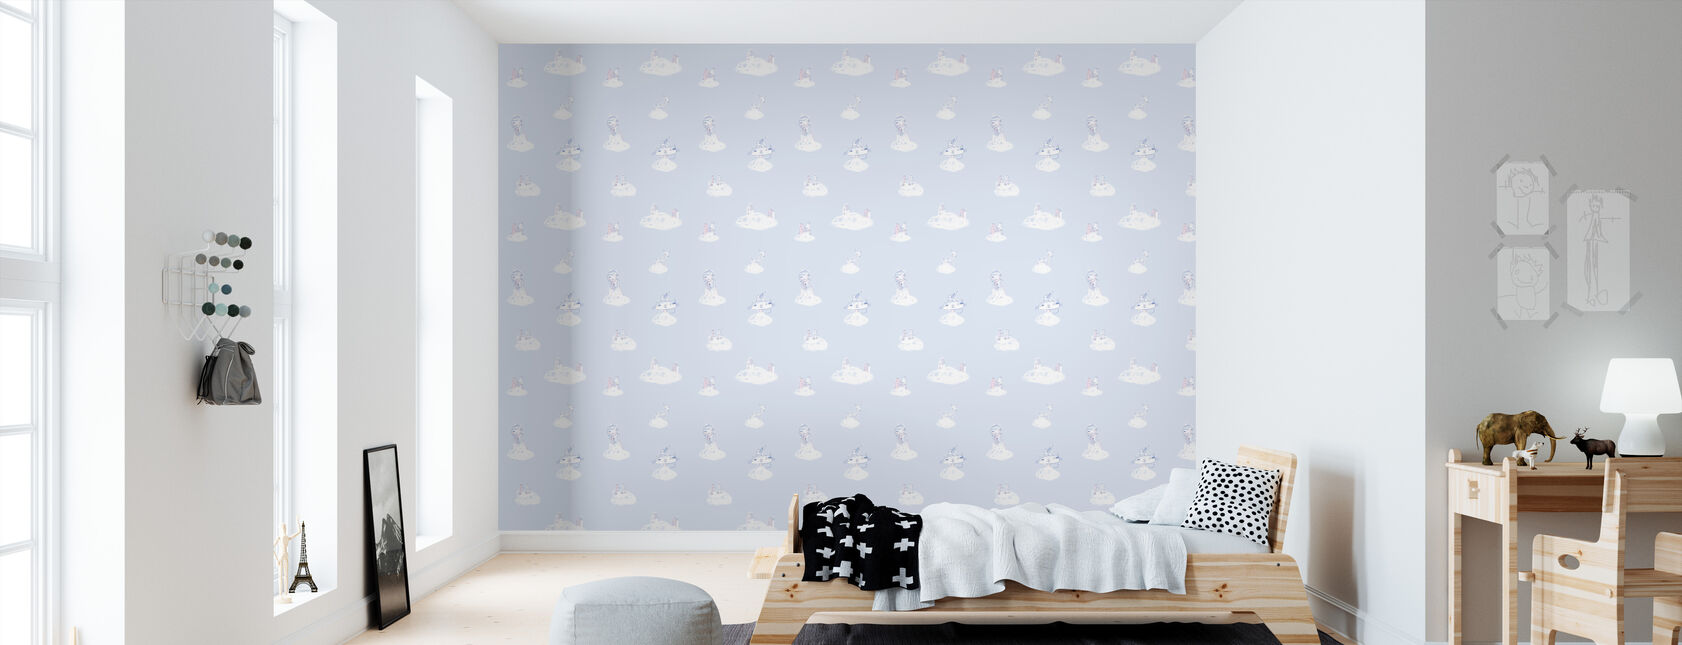 Cloud Princess - Wallpaper - Kids Room